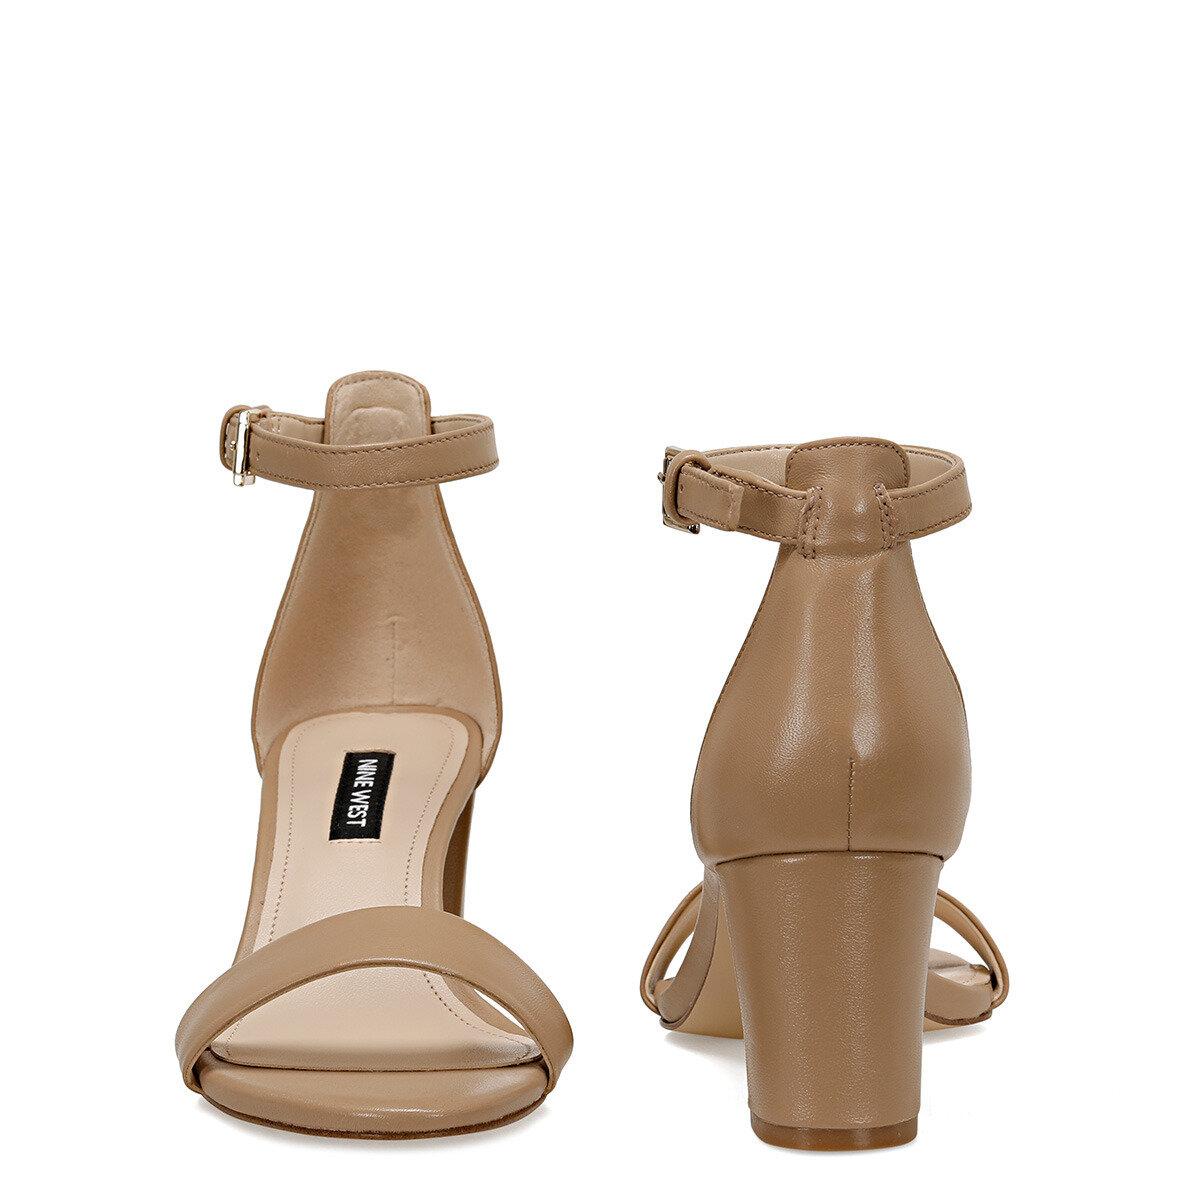 PRUCE Naturel Kadın Topuklu Sandalet